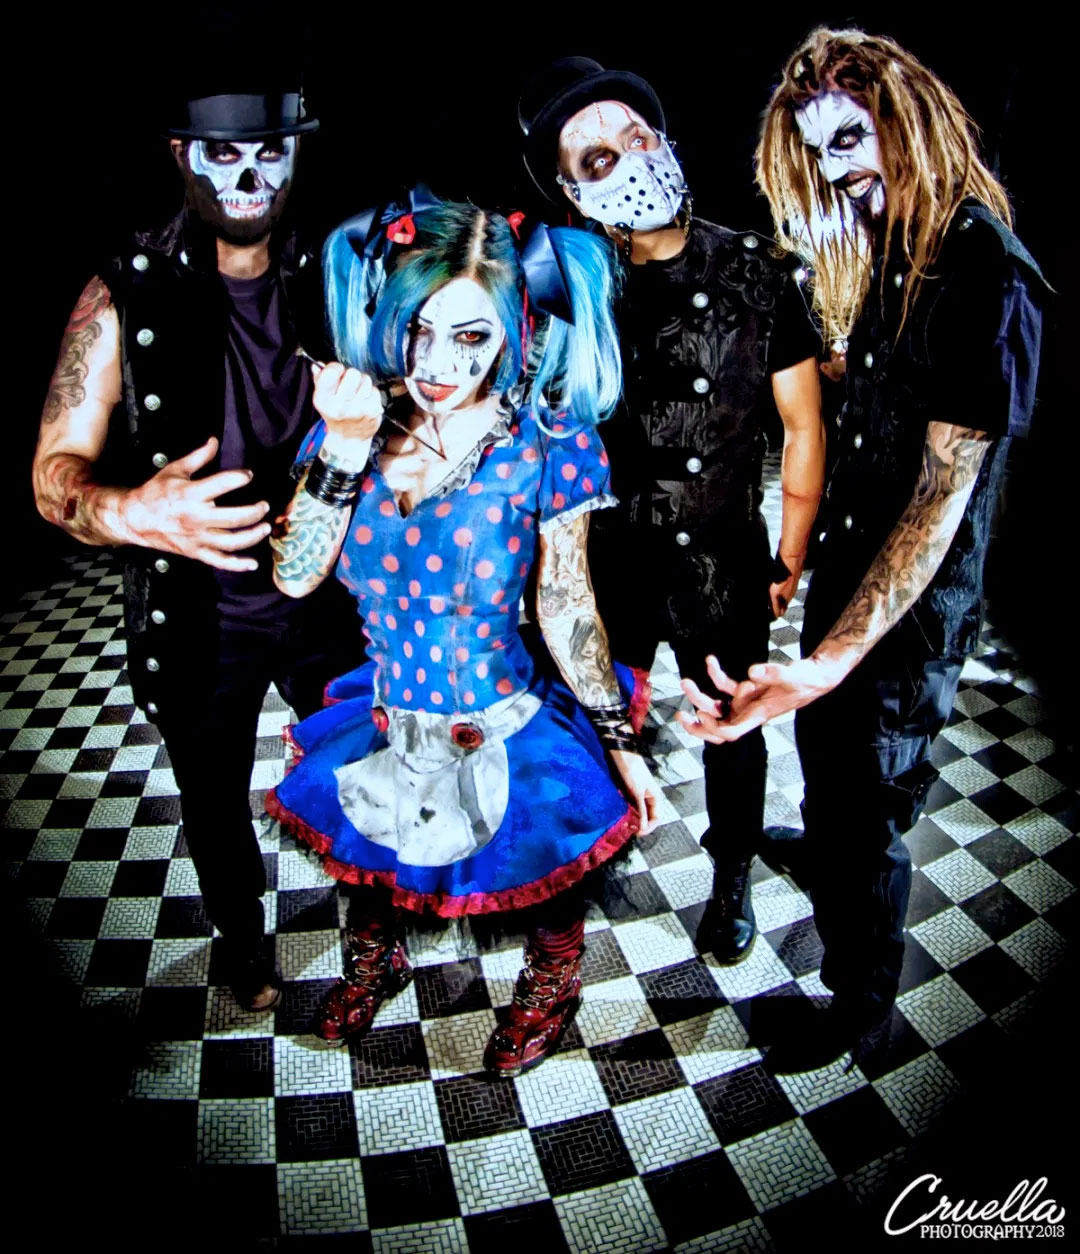 Raven Black promo image.